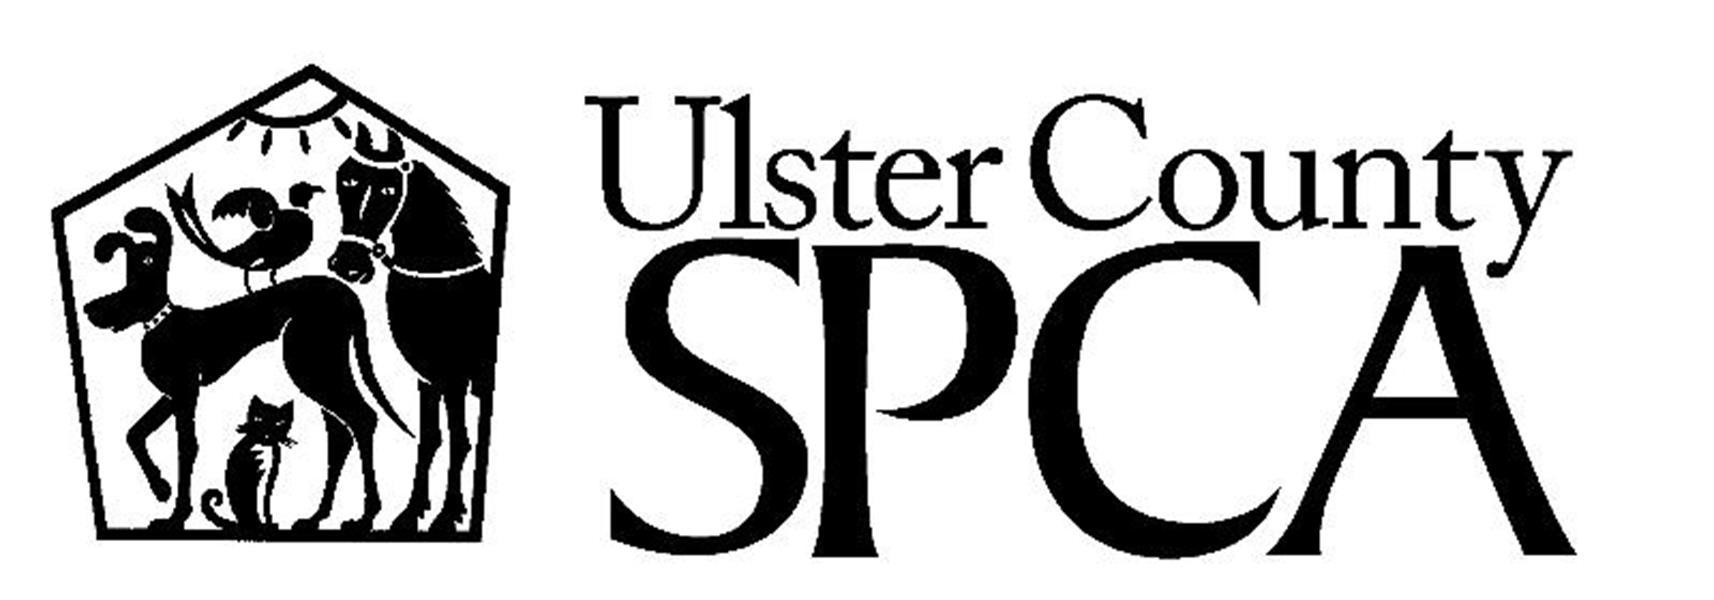 Ulster County SPCA | ANIMAL ORGANIZATIONS | NON-PROFIT